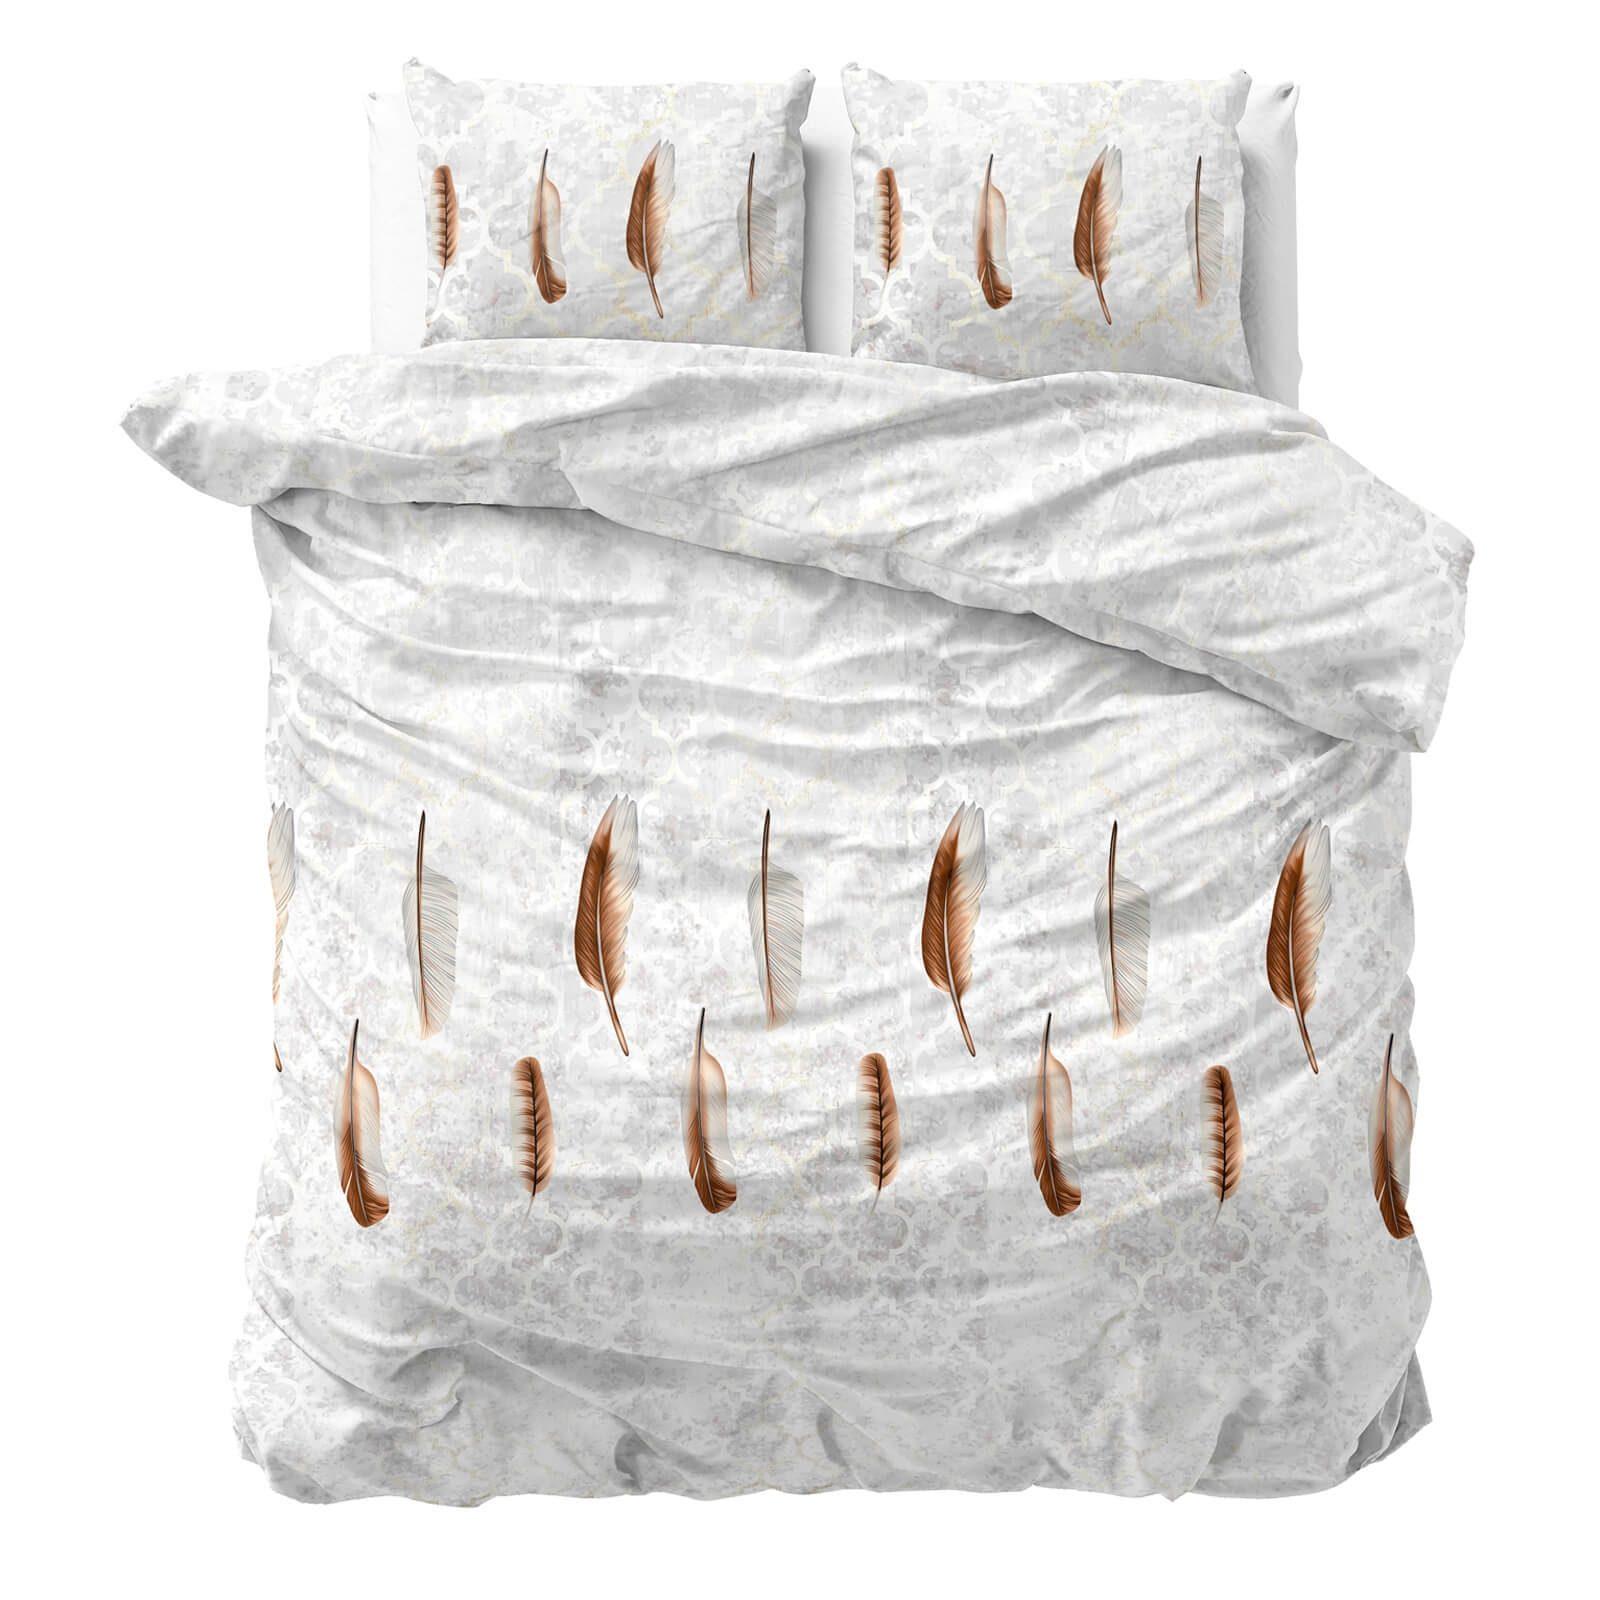 Bombažno-satenasta posteljnina Svilanit Feather